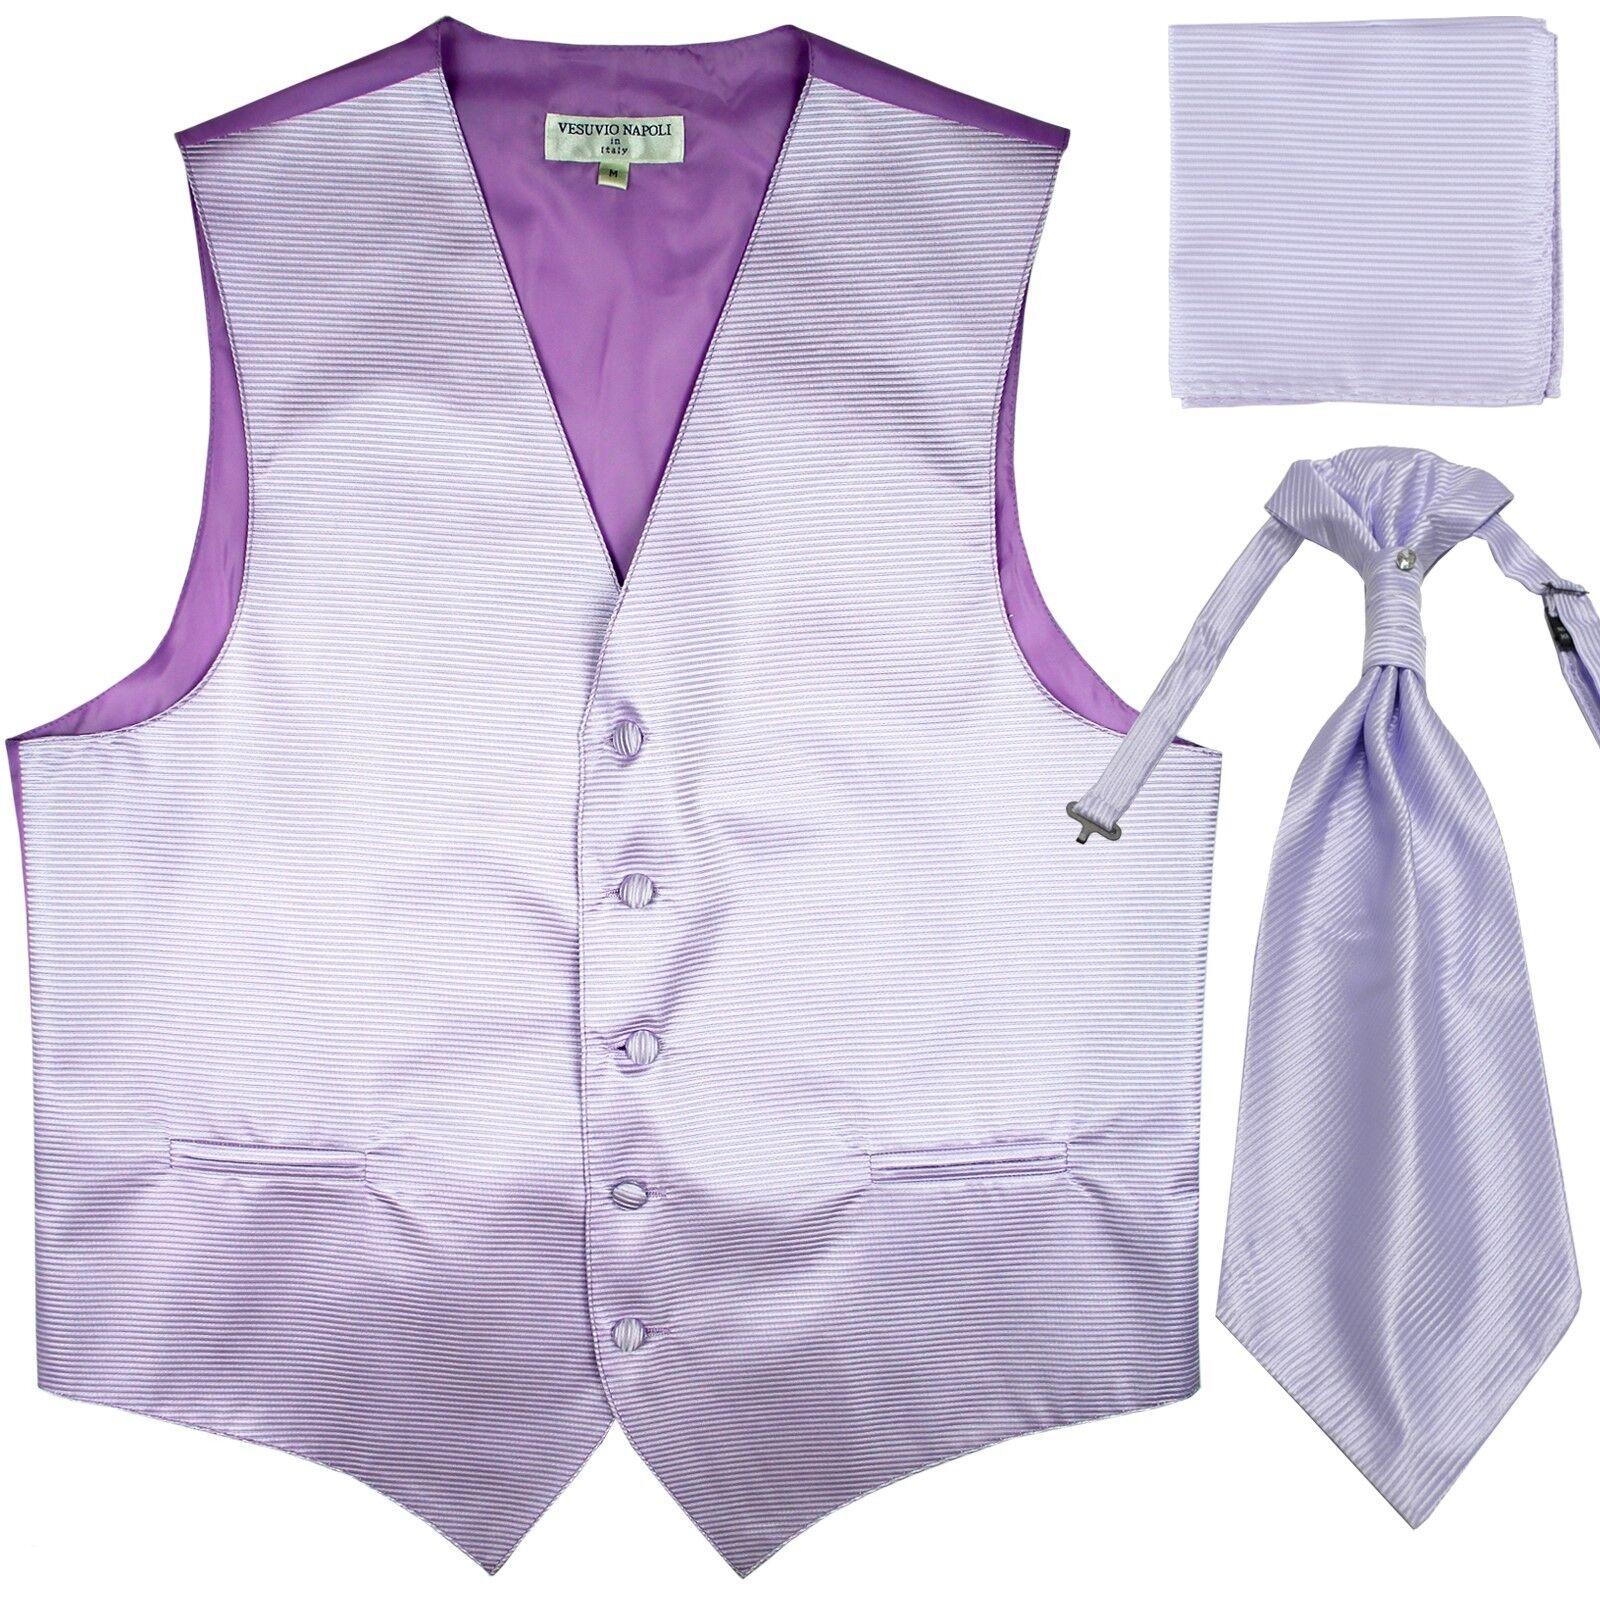 New Men's Horizontal Stripes Tuxedo Vest Waistcoat & Ascot & Hankie Set Lavender